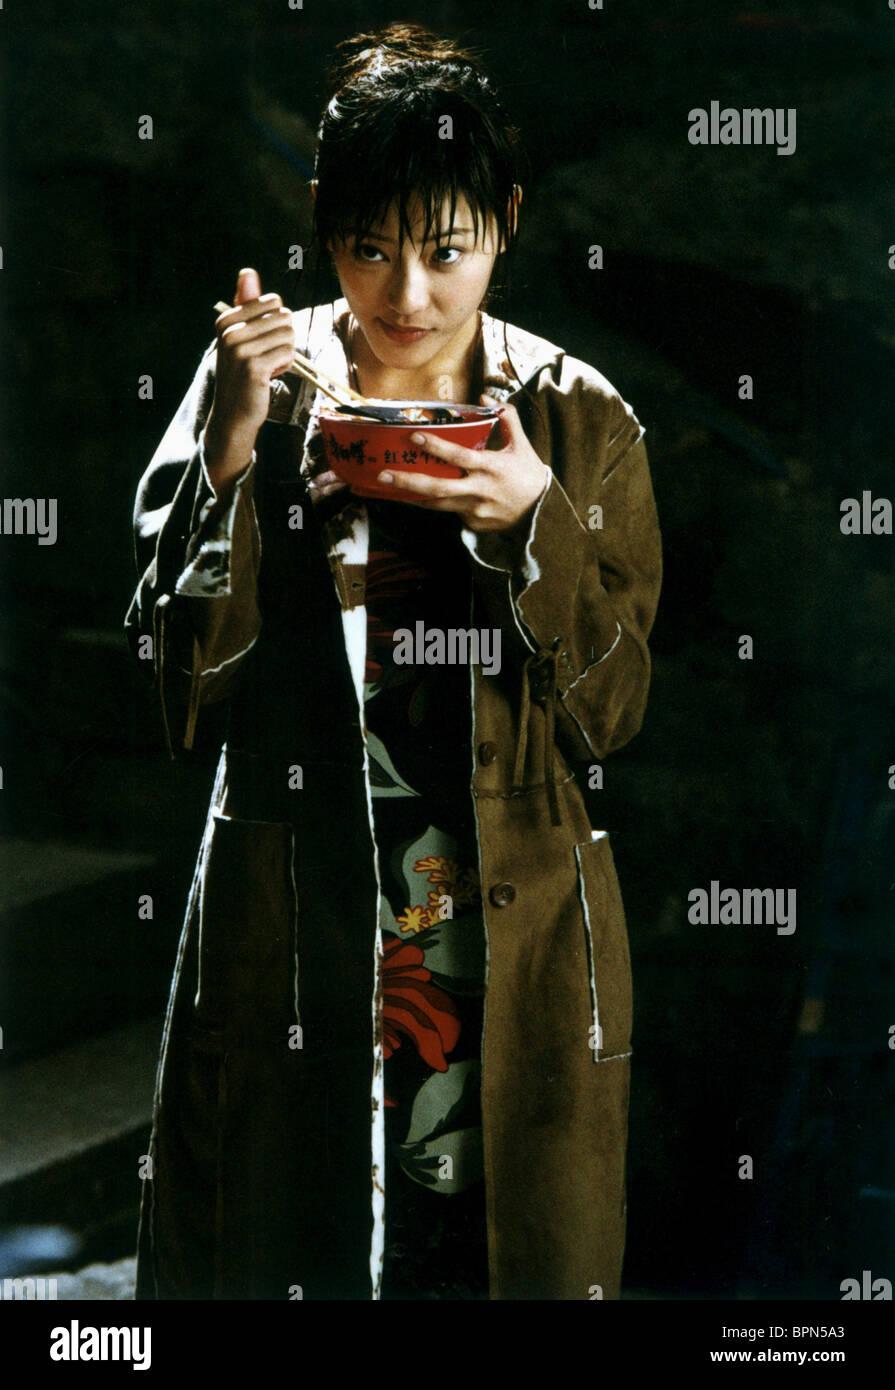 CHERRIE YING buttare giù (2004) Immagini Stock